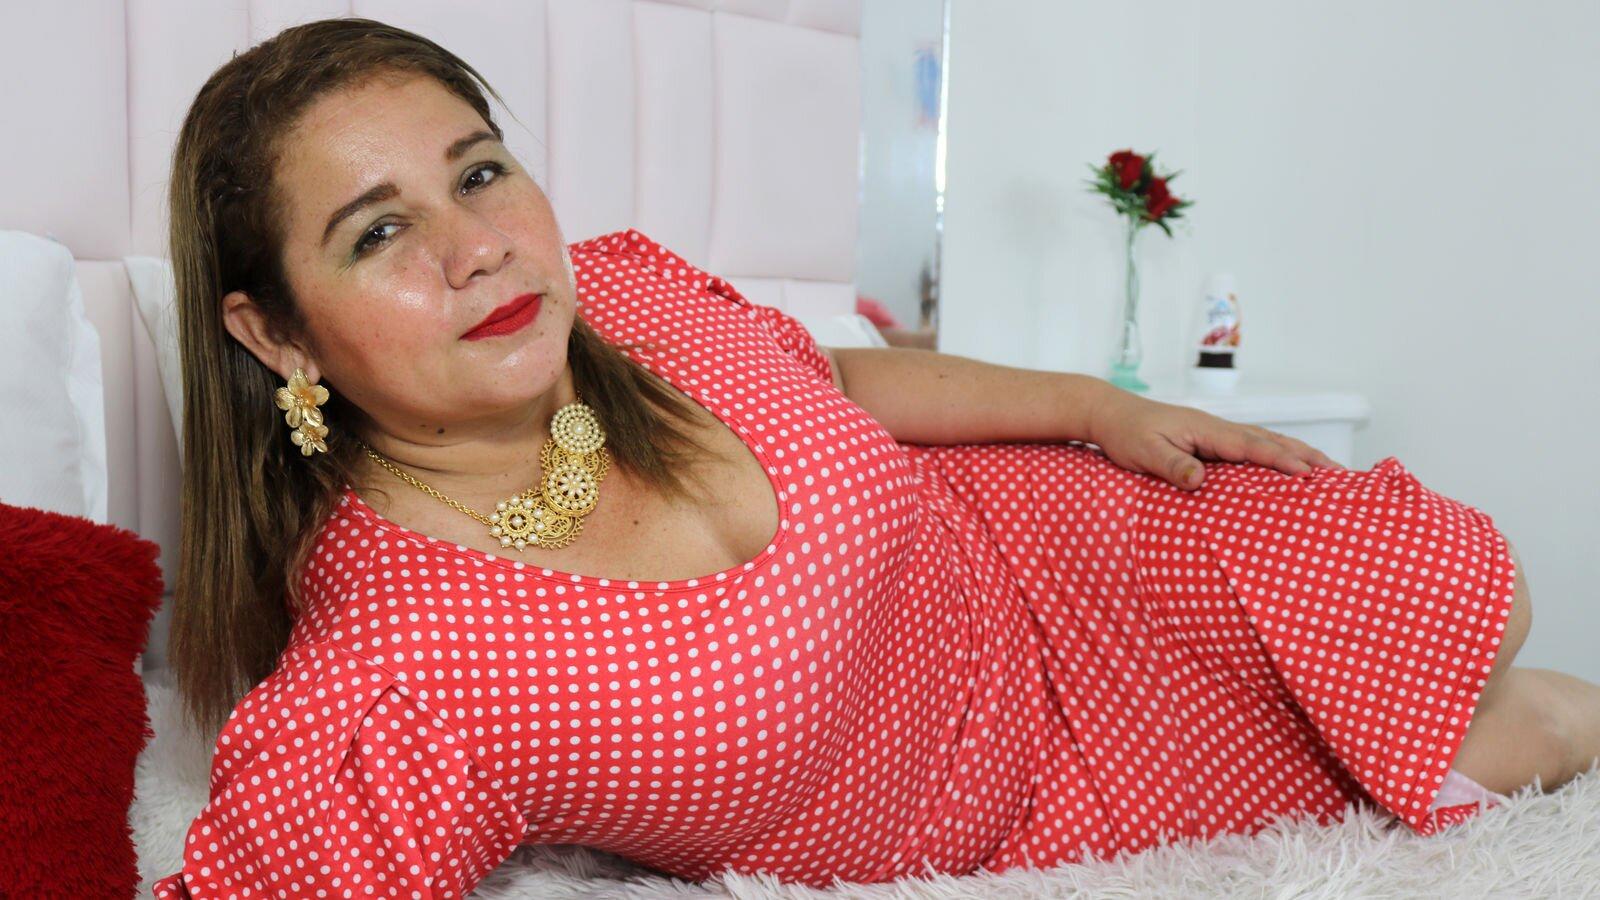 LorenaWilson